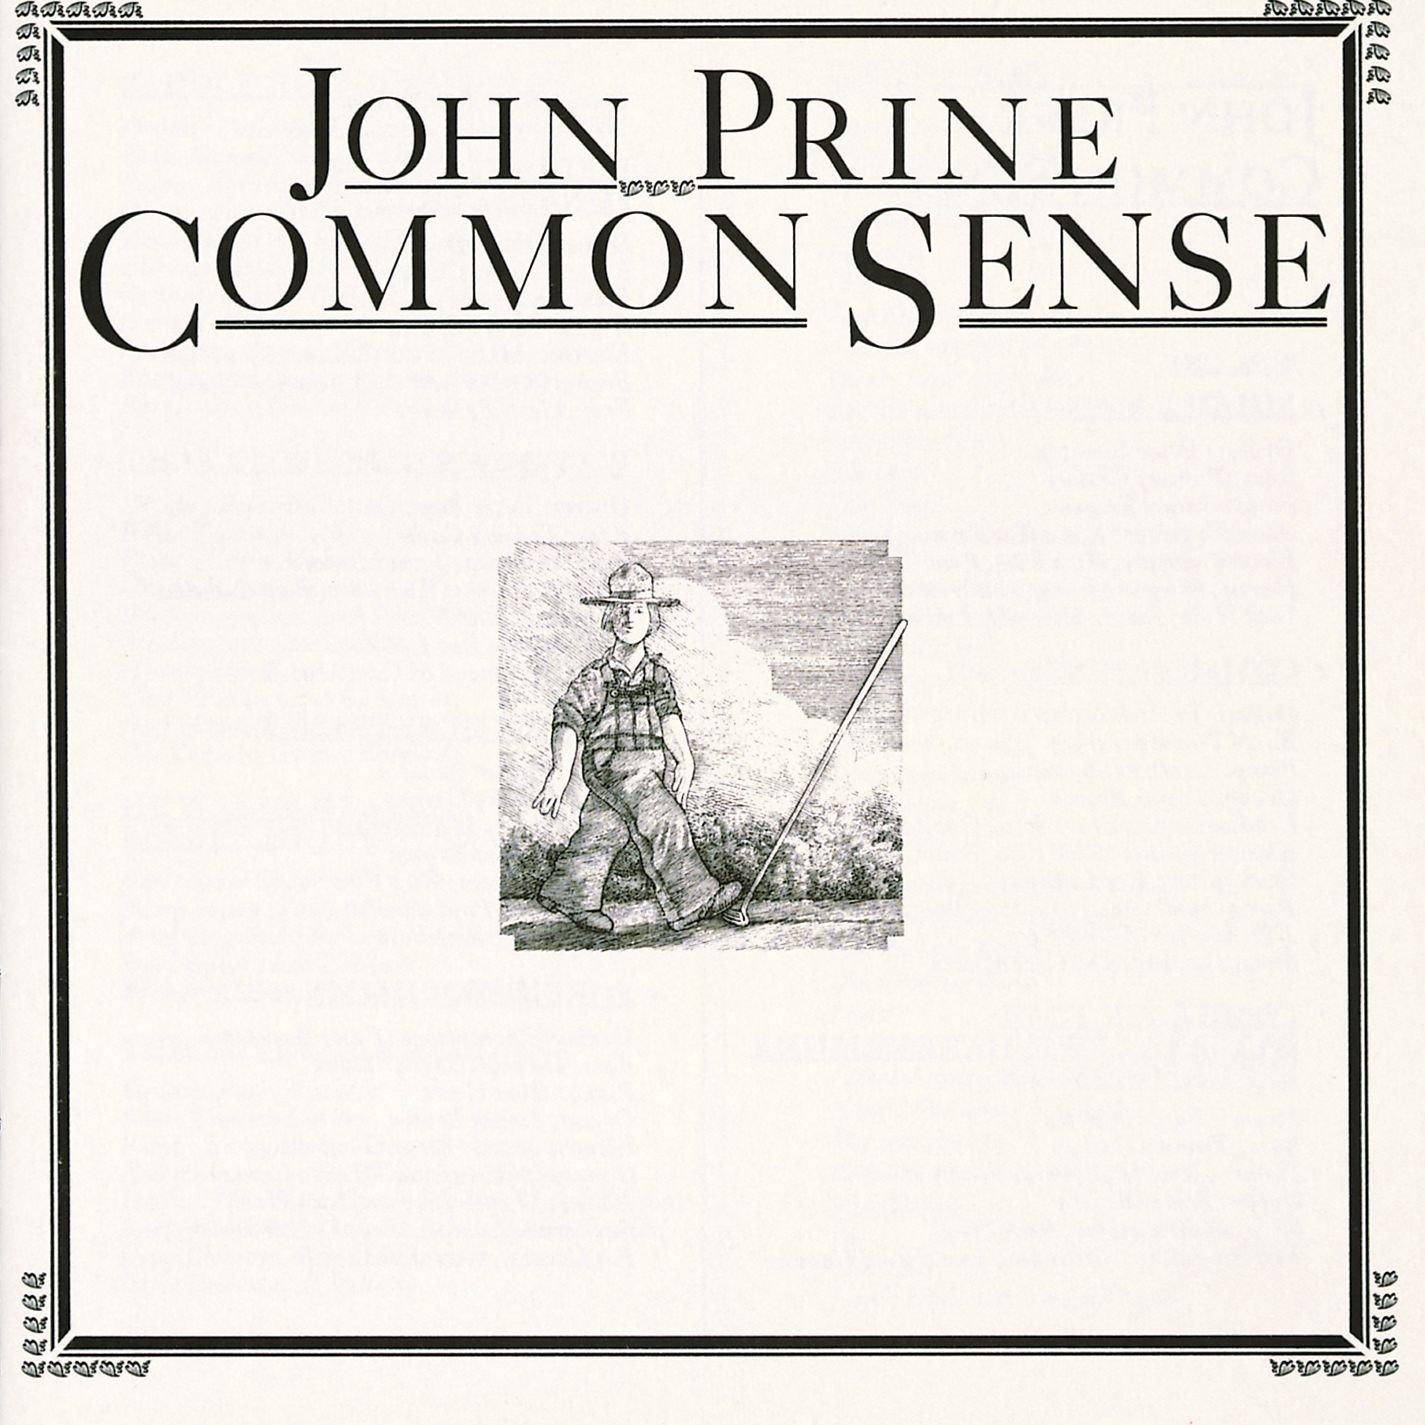 Виниловая пластинка John Prine - Common Sense (180 Gram/Black Vinyl)